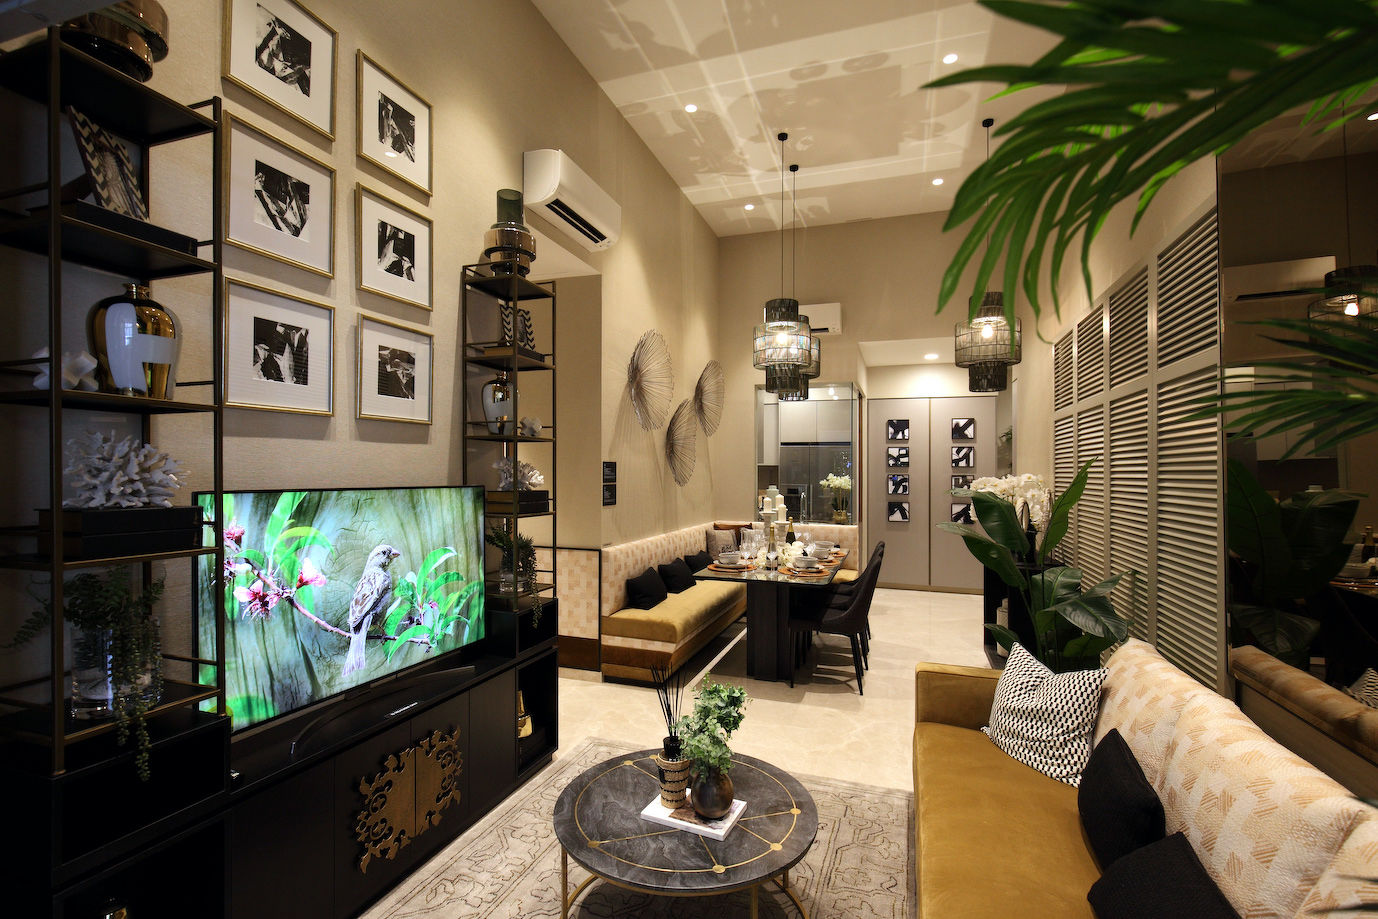 Daintree Residence showflat - EDGEPROP SINGAPORE